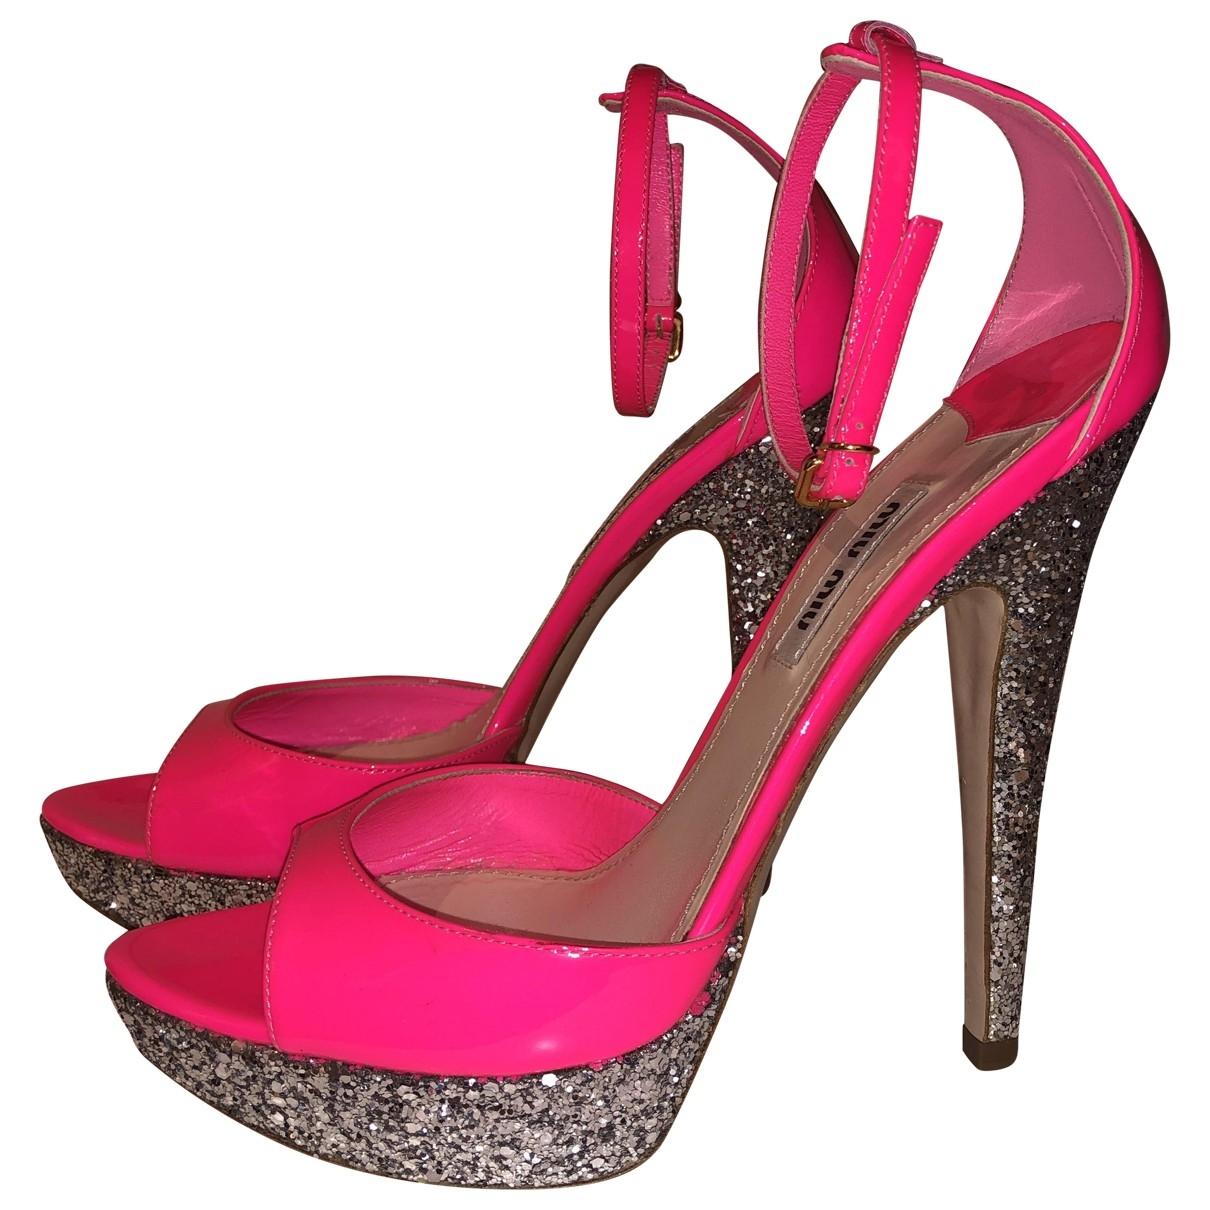 Miu Miu - Sandales   pour femme en cuir verni - rose